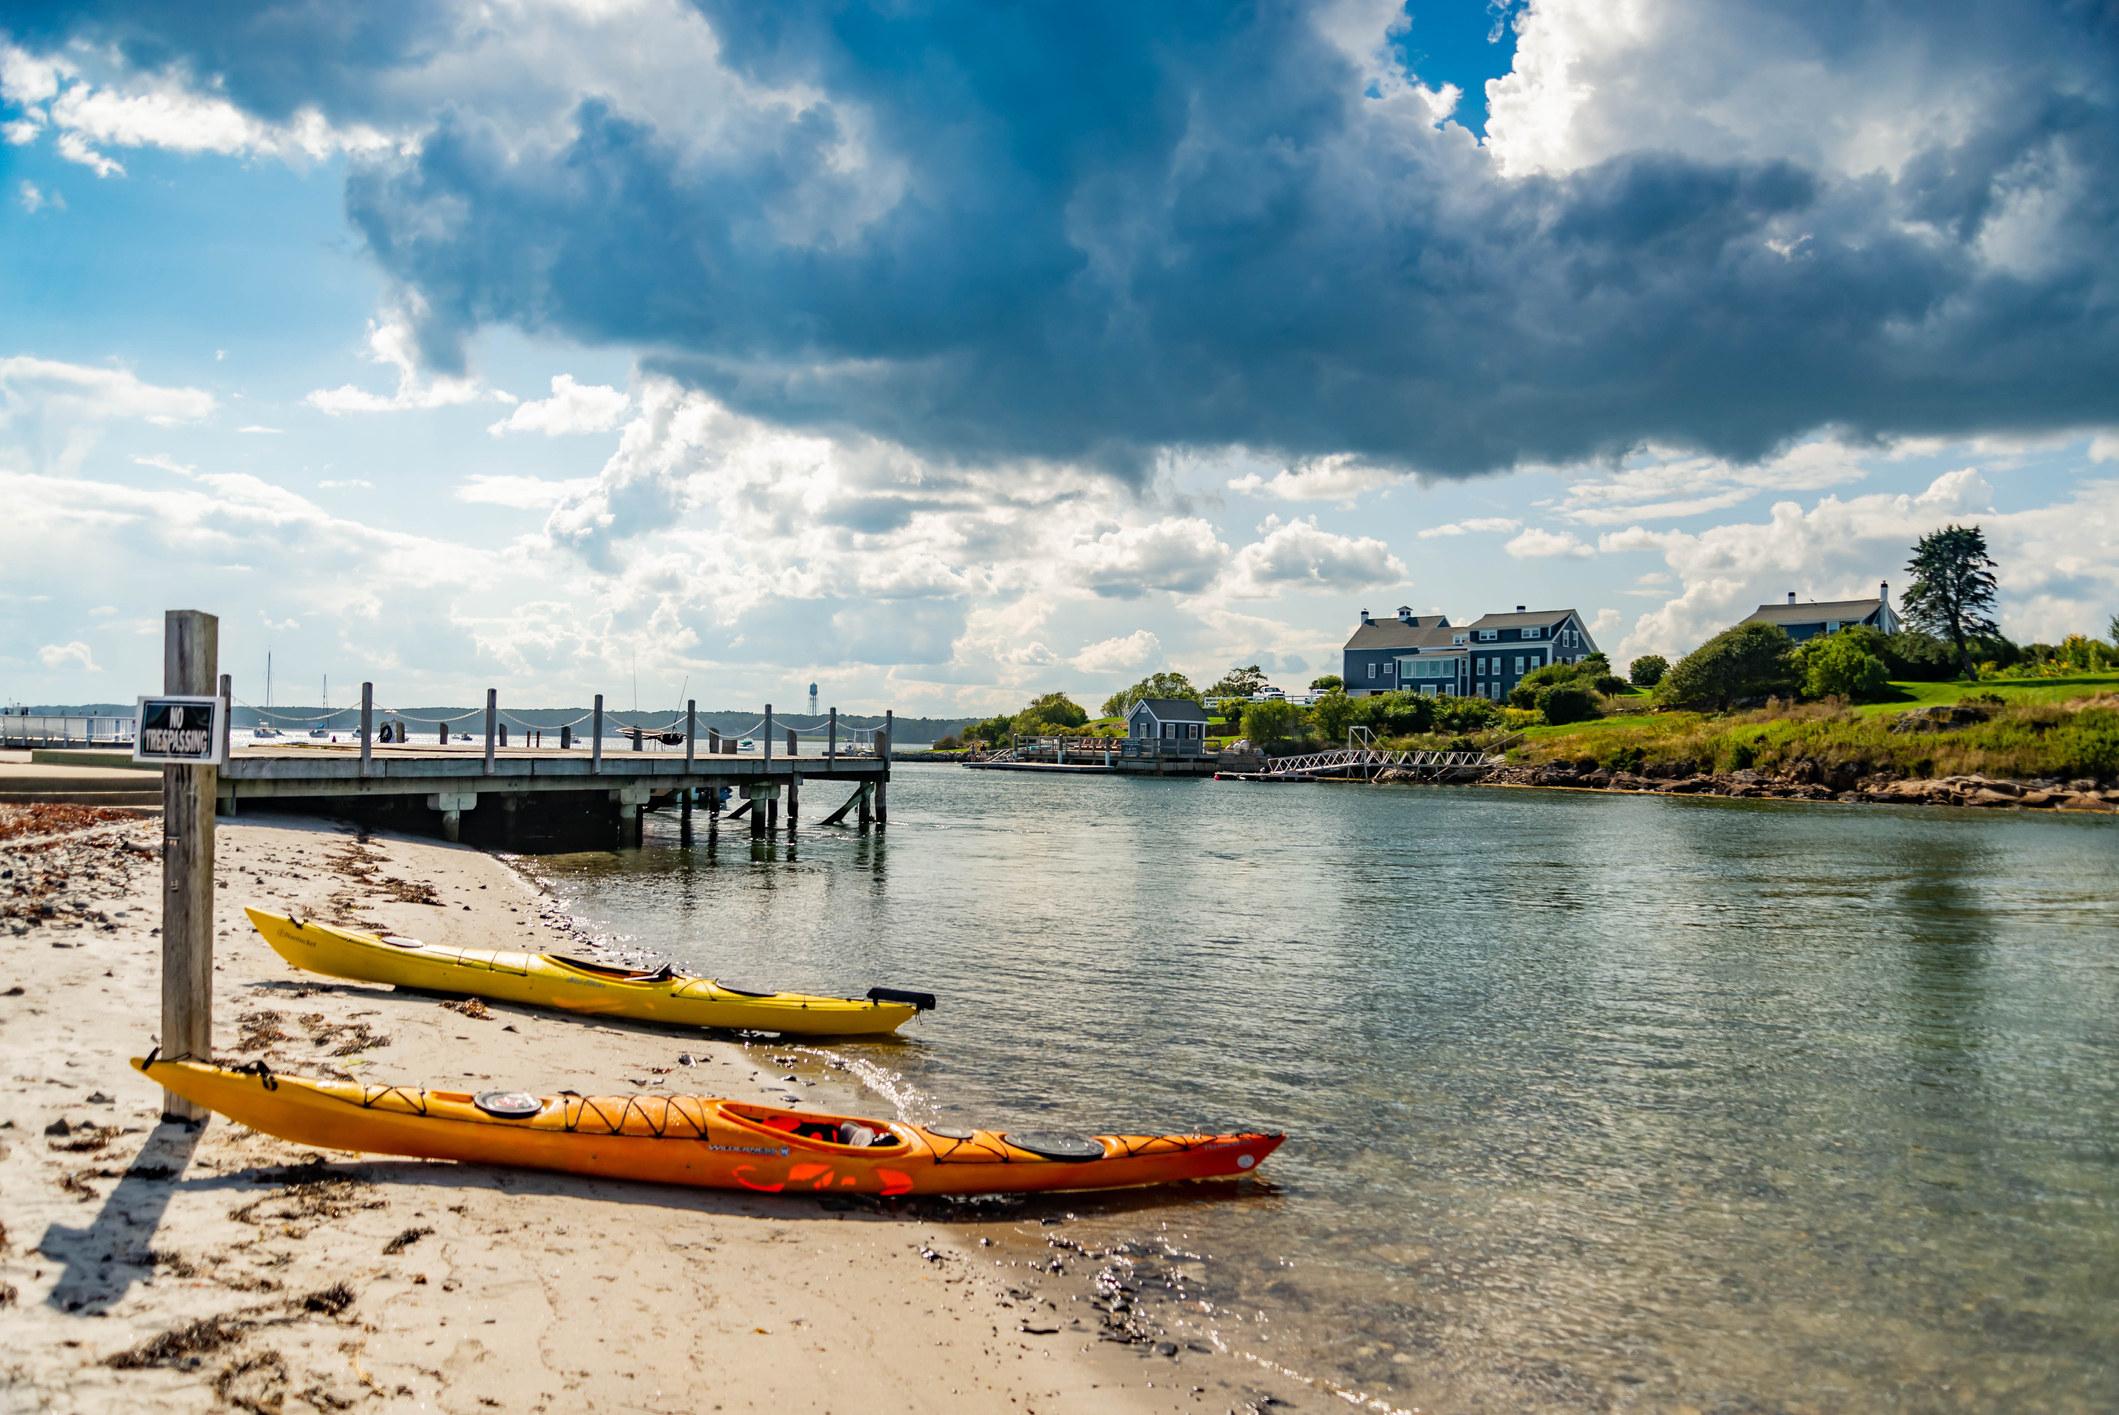 Kayaks on the beach in Maine